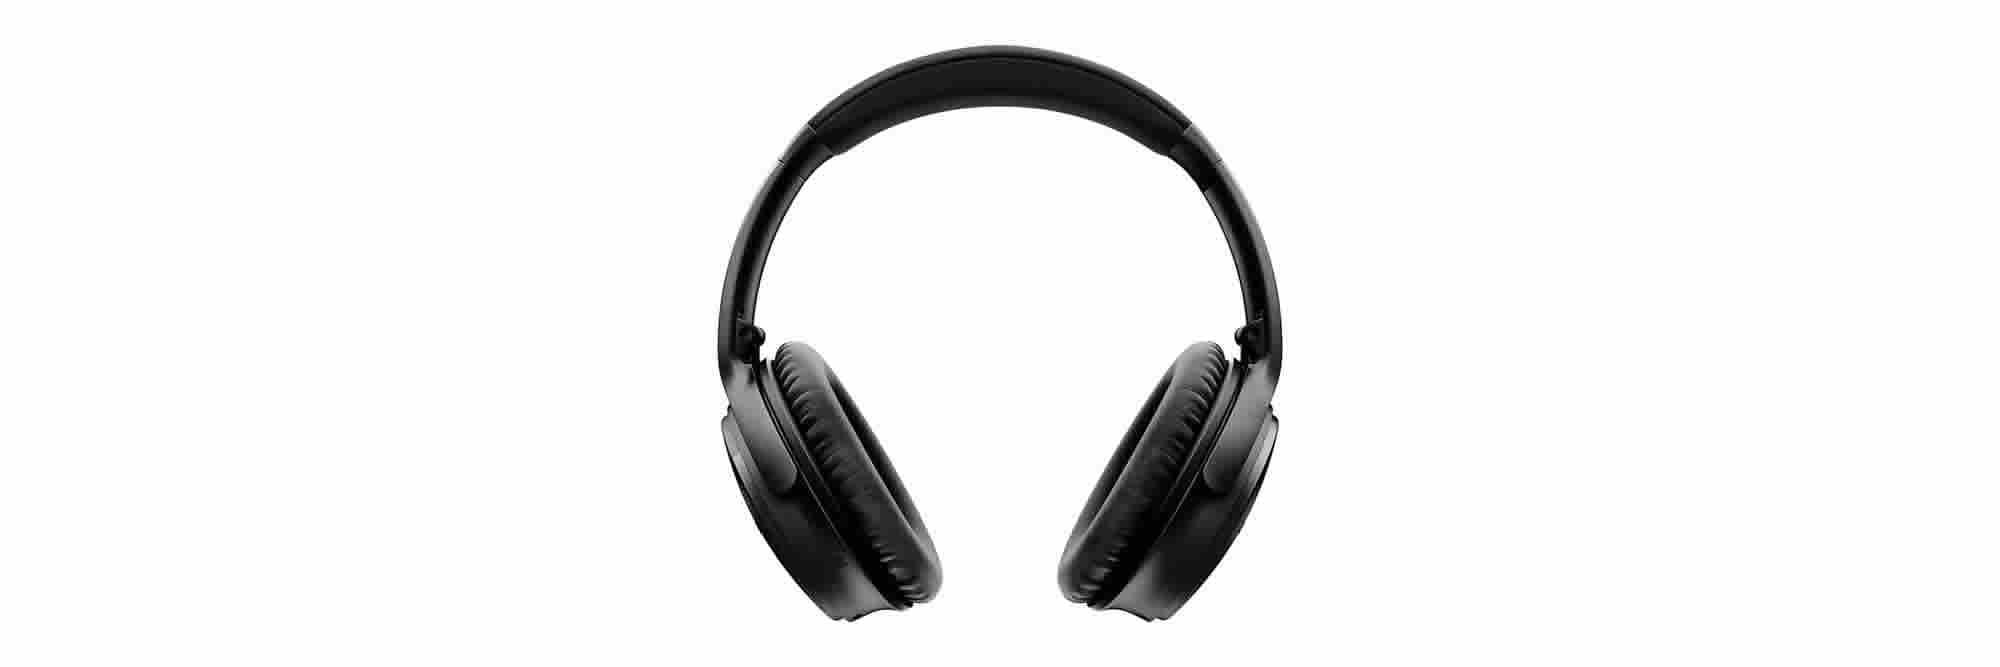 Noise Canceling Headphones Quiz